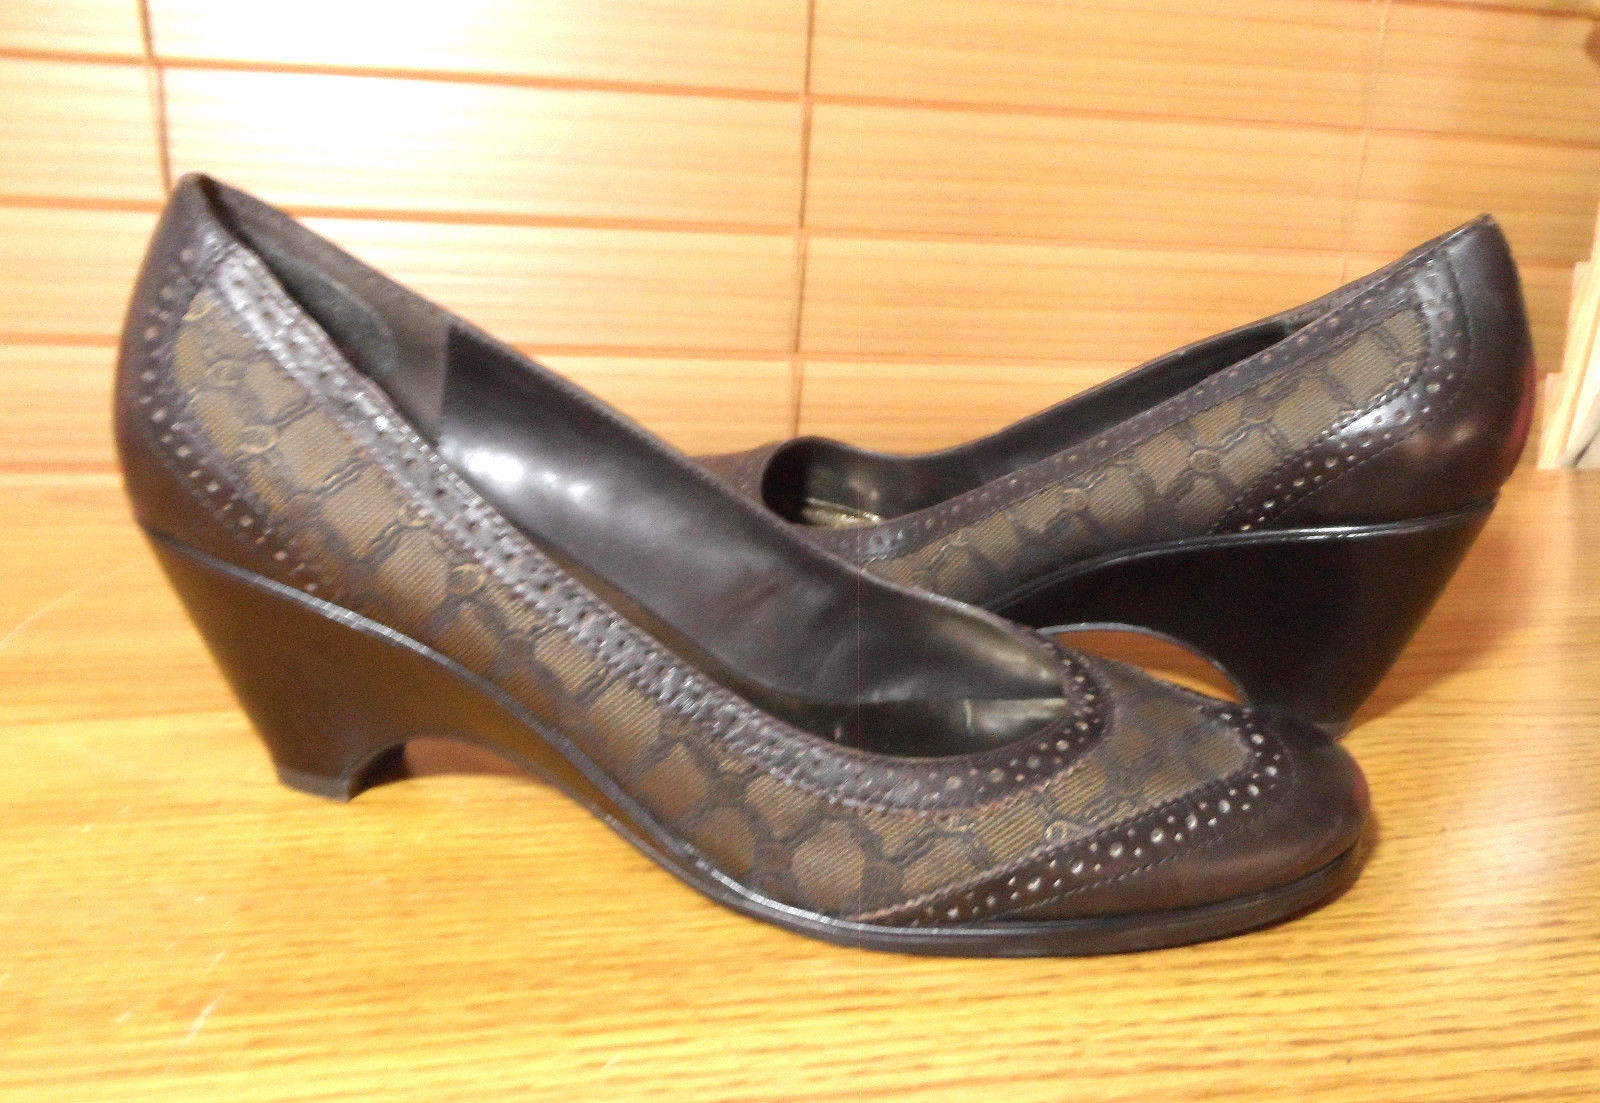 0d27e8d223b Etienne Aigner Heels Dress Shoes 8.5M Brown and 50 similar items. 57